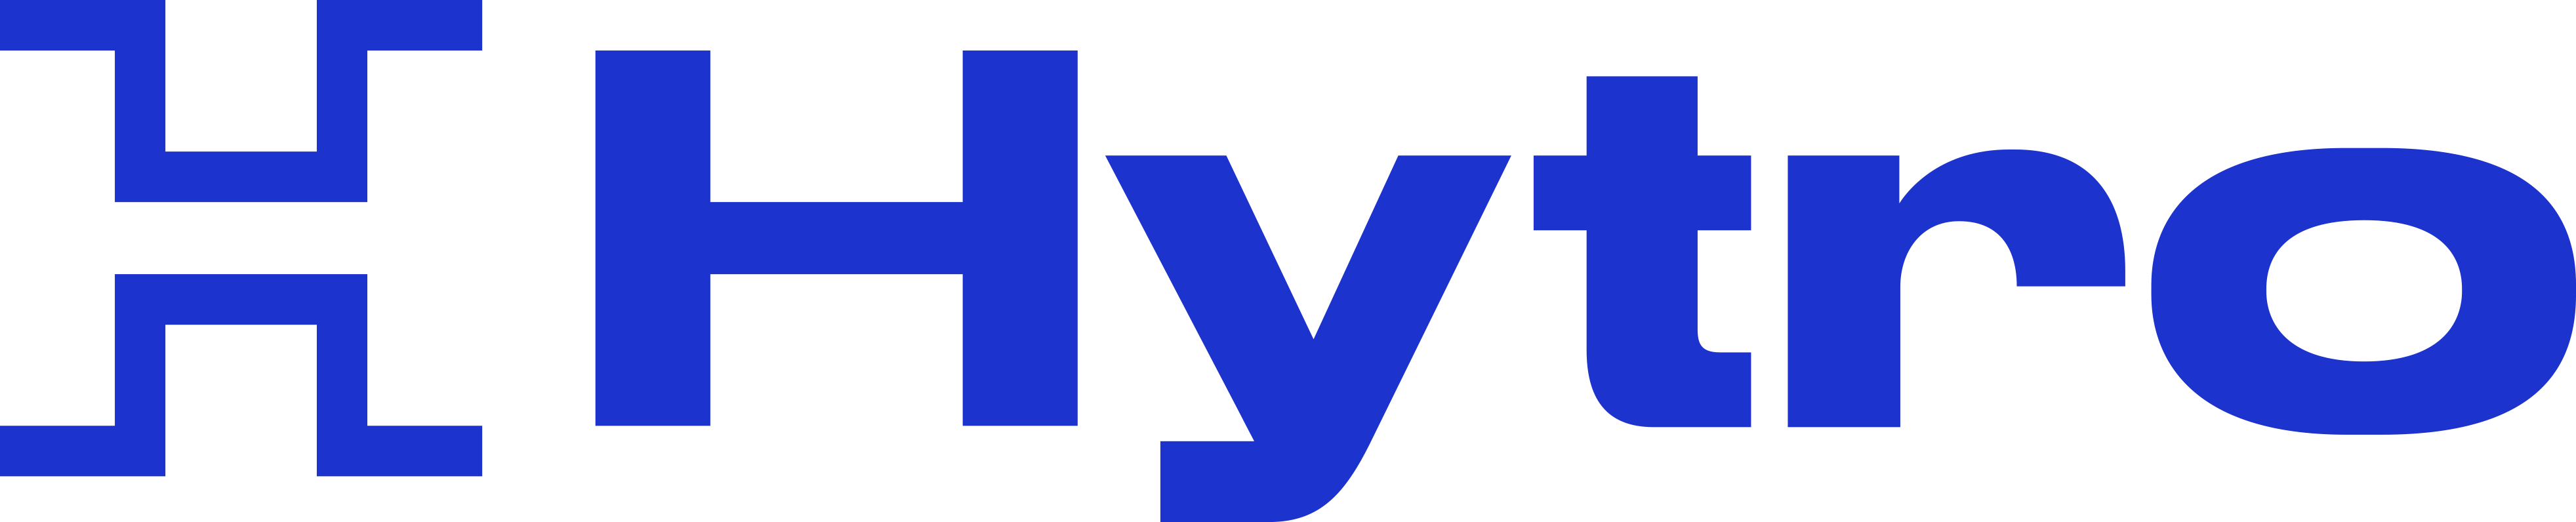 Hytro